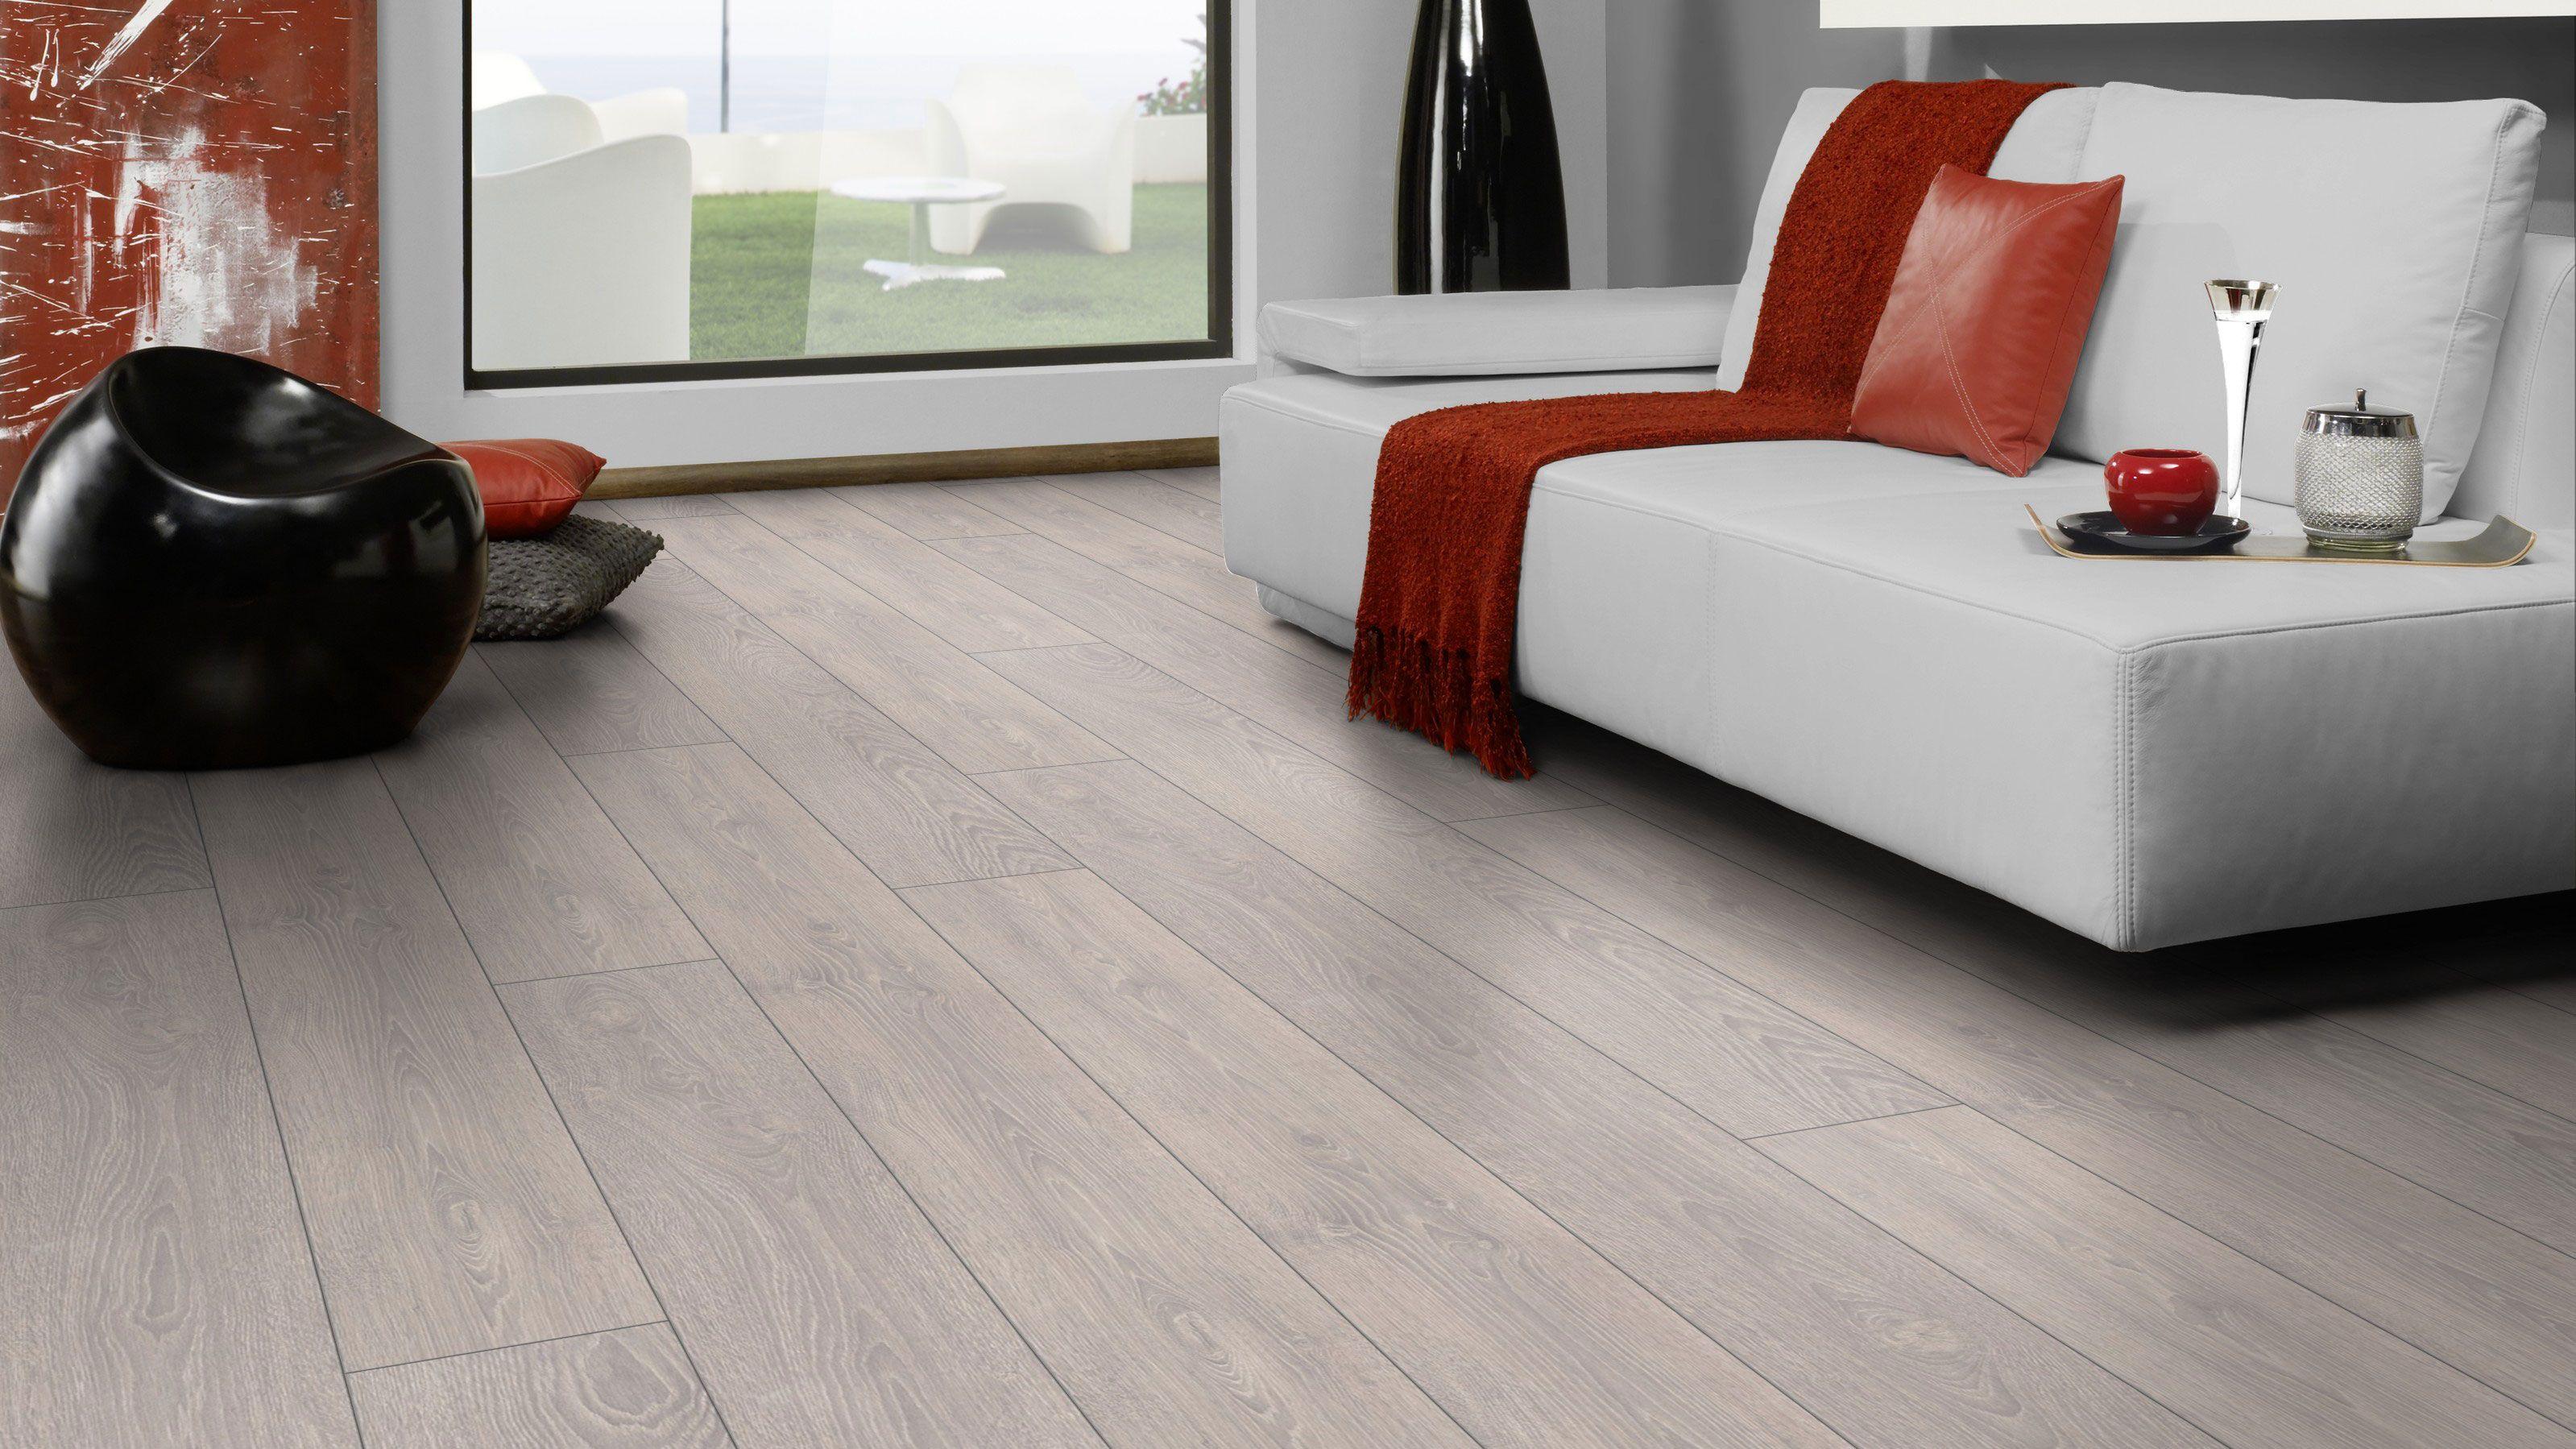 Kronotex Laminate Flooring kronotex 12mm fantasy wood laminate flooring Kronotex Capital Oak Light D2800 Wood Plankslaminate Flooringwhite